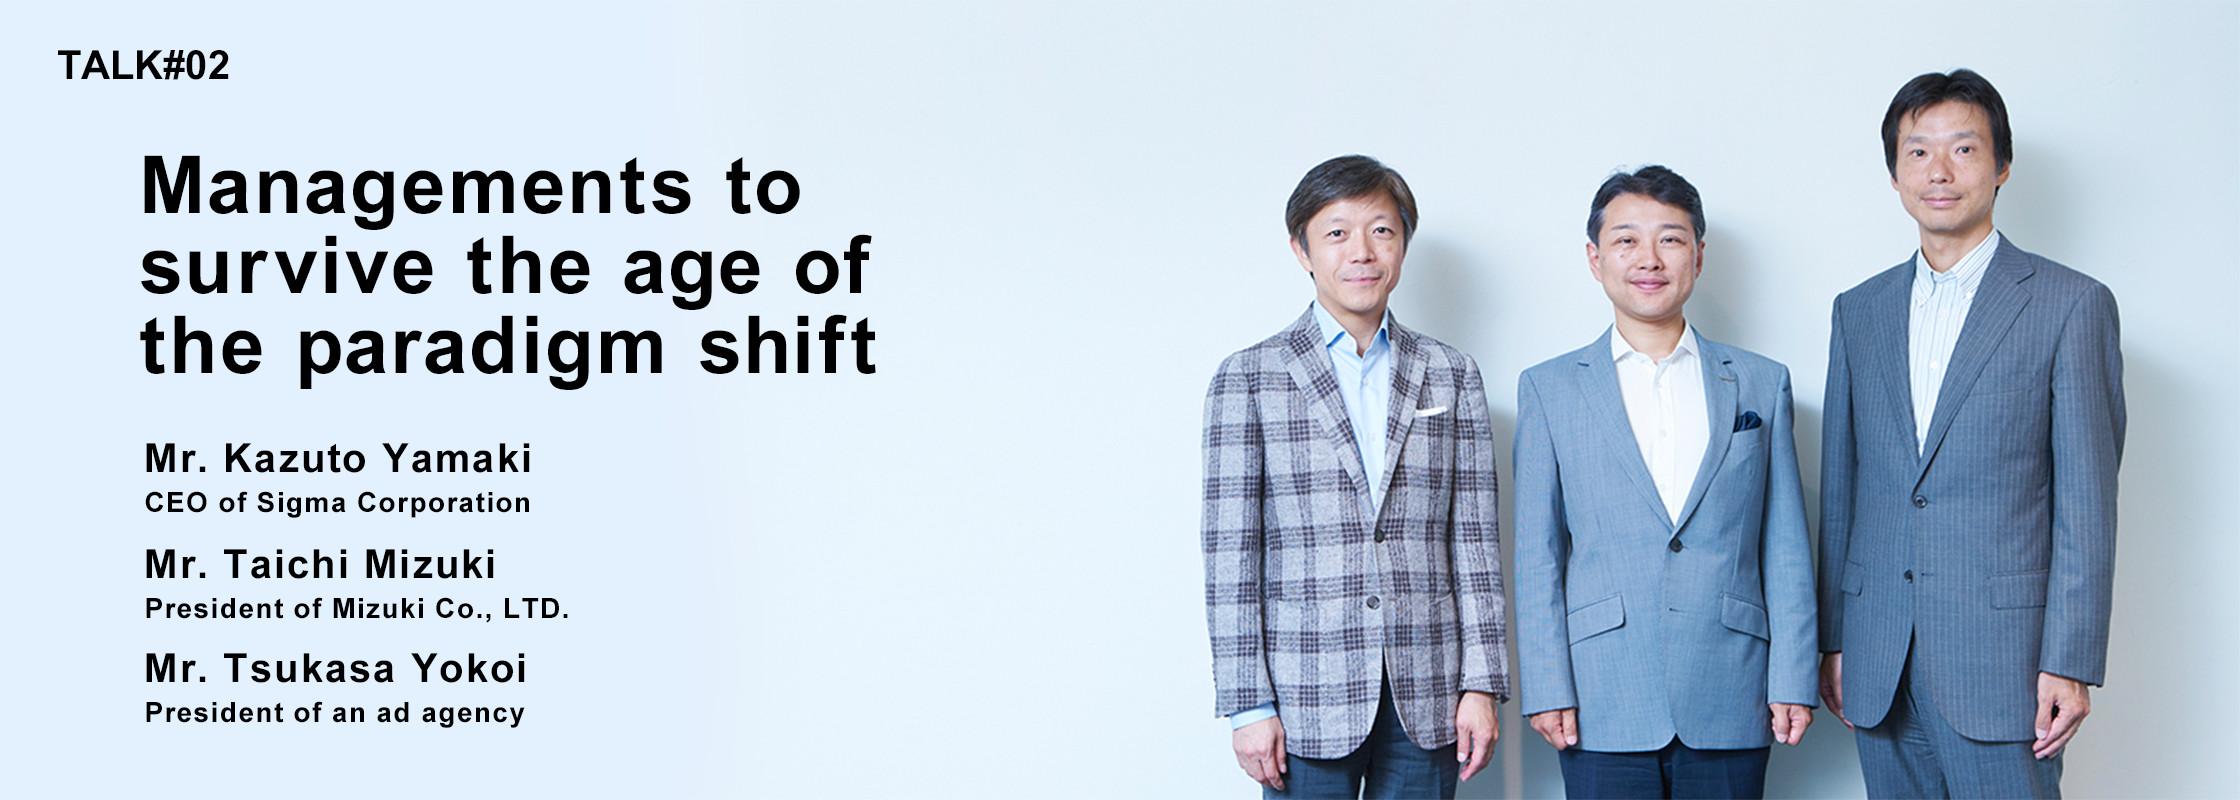 TALK#2 Managements to surviving times of the paradigm shift Mr. Kazuto Yamaki CEO of Sigma Corporation Mr. Taichi Mizuki President of Mizuki Co., LTD. Mr. Tsukasa Yokoi President of an ad agency